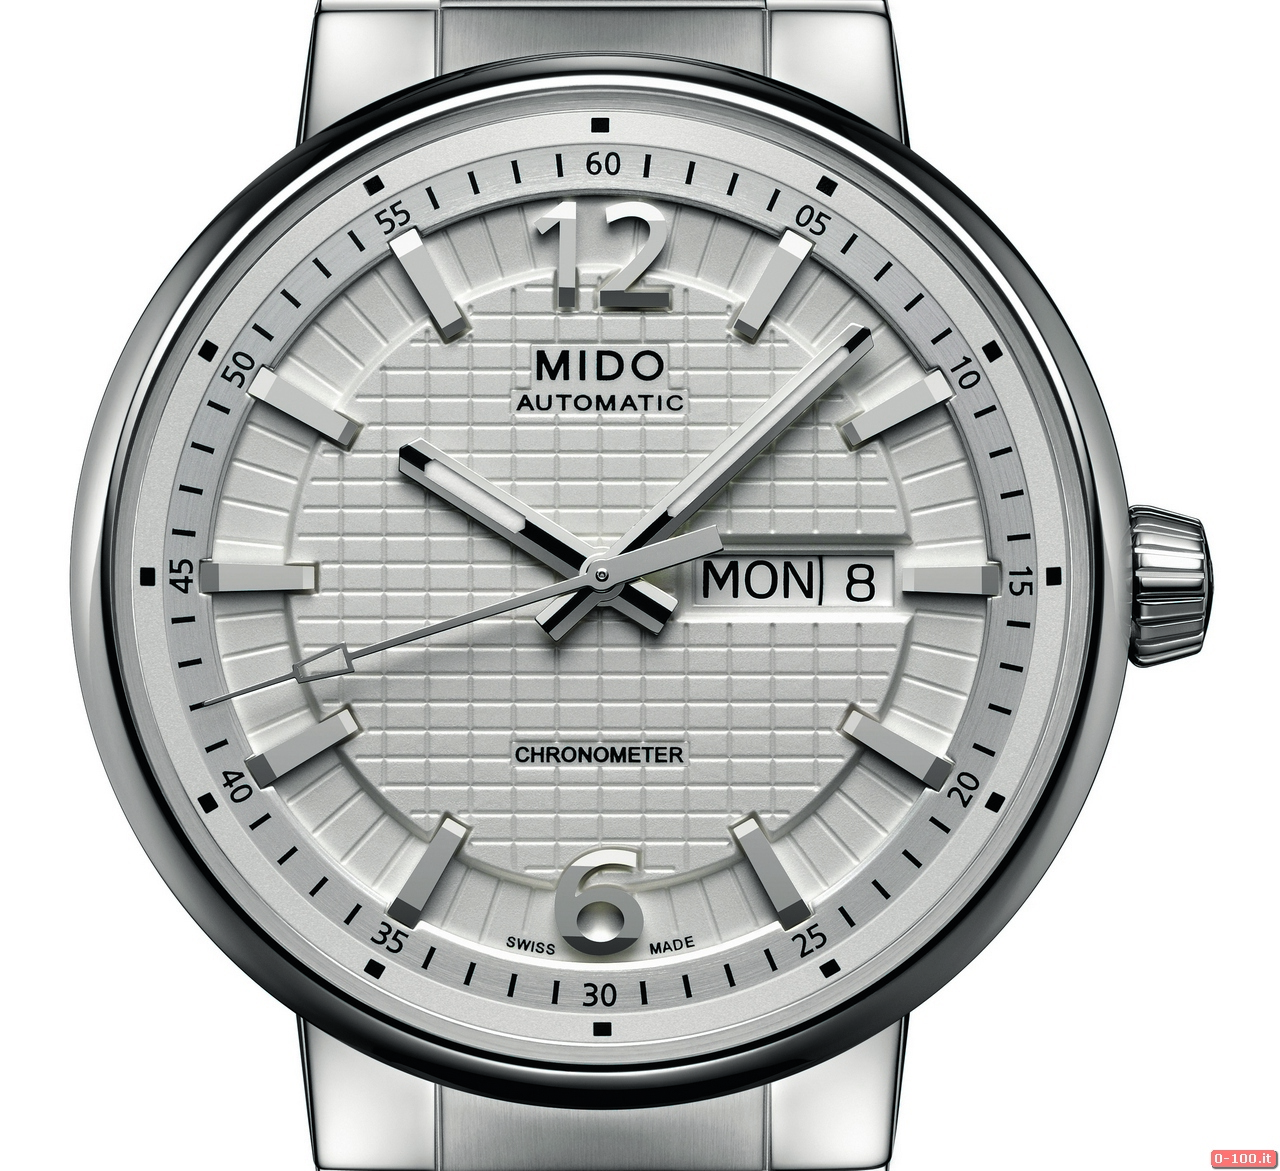 baselworld-2013-mido-great-wall_0-100 2